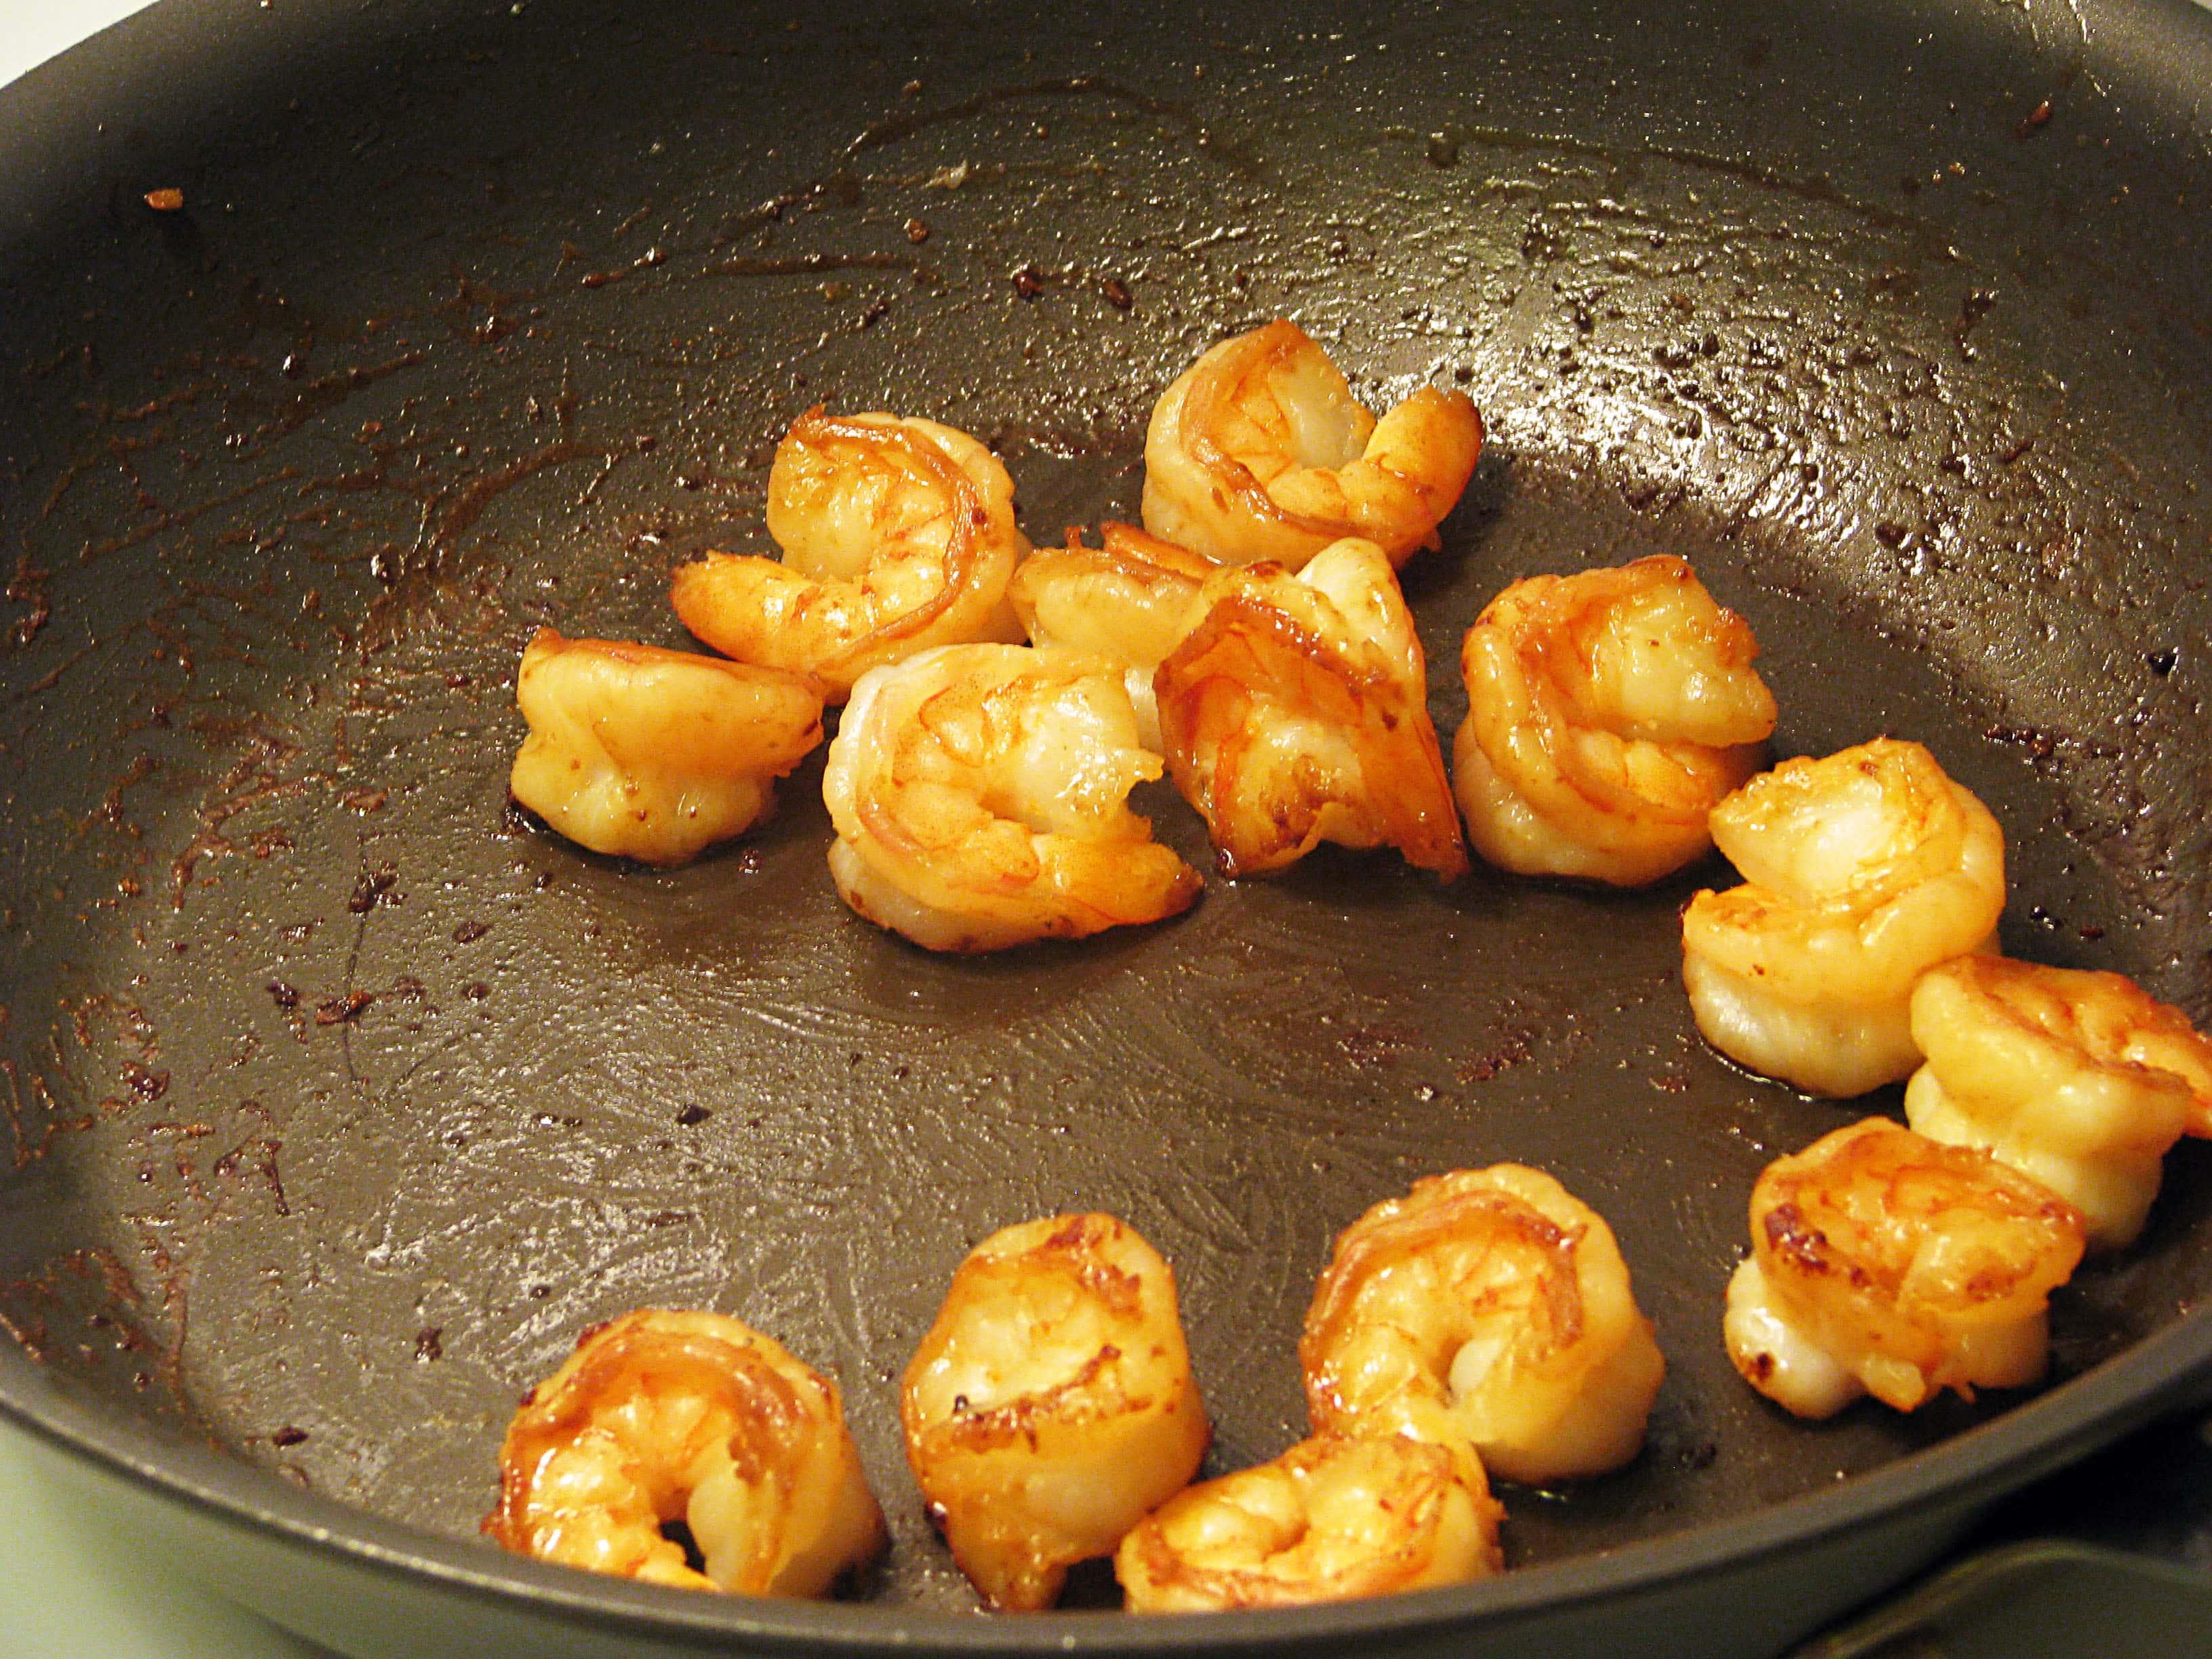 Dashing And Easiest Protein Ever Hibachi Shrimp Hibachi Steak Sauce Recipe Hibachi Grill Steak Recipe nice food Hibachi Steak Recipe